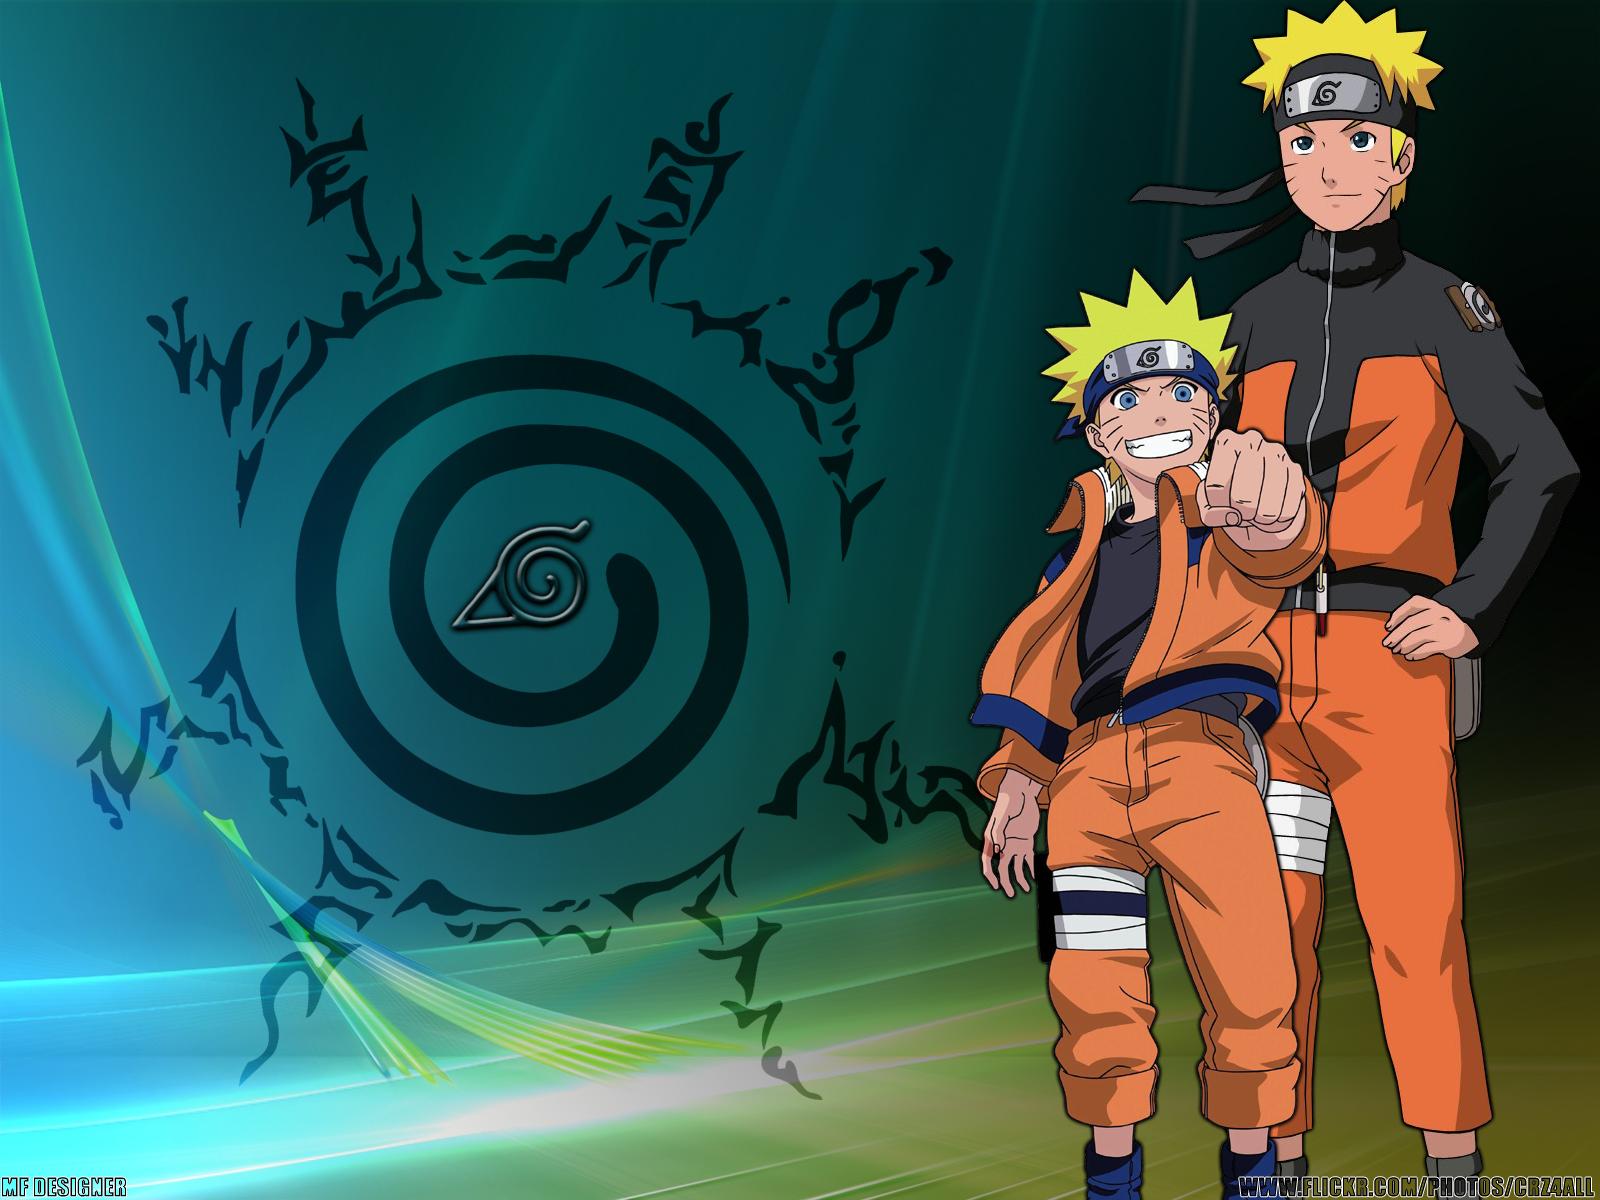 Wallpapers HD de los personajes de Naruto   Taringa 1600x1200